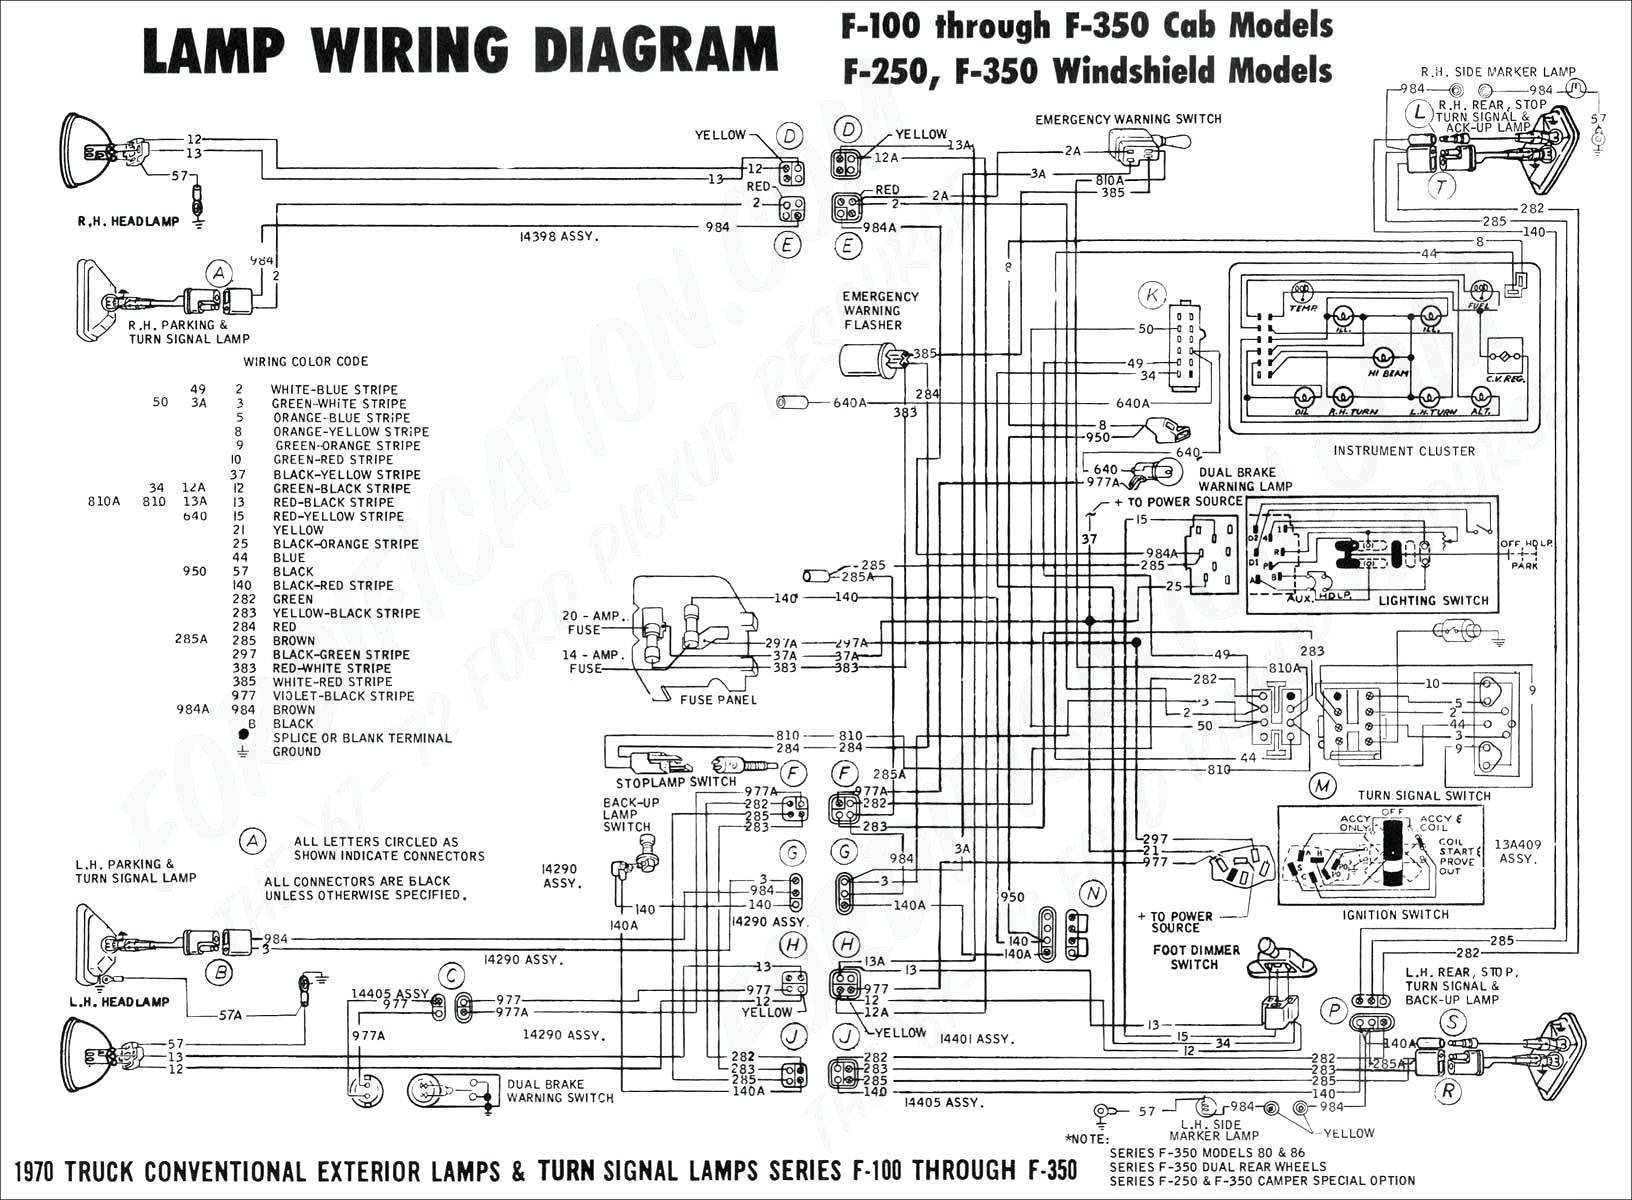 Motorcycle Engine Diagram Honda Beat Motorcycle Wiring Diagram Refrence Honda Beat Motorcycle Of Motorcycle Engine Diagram